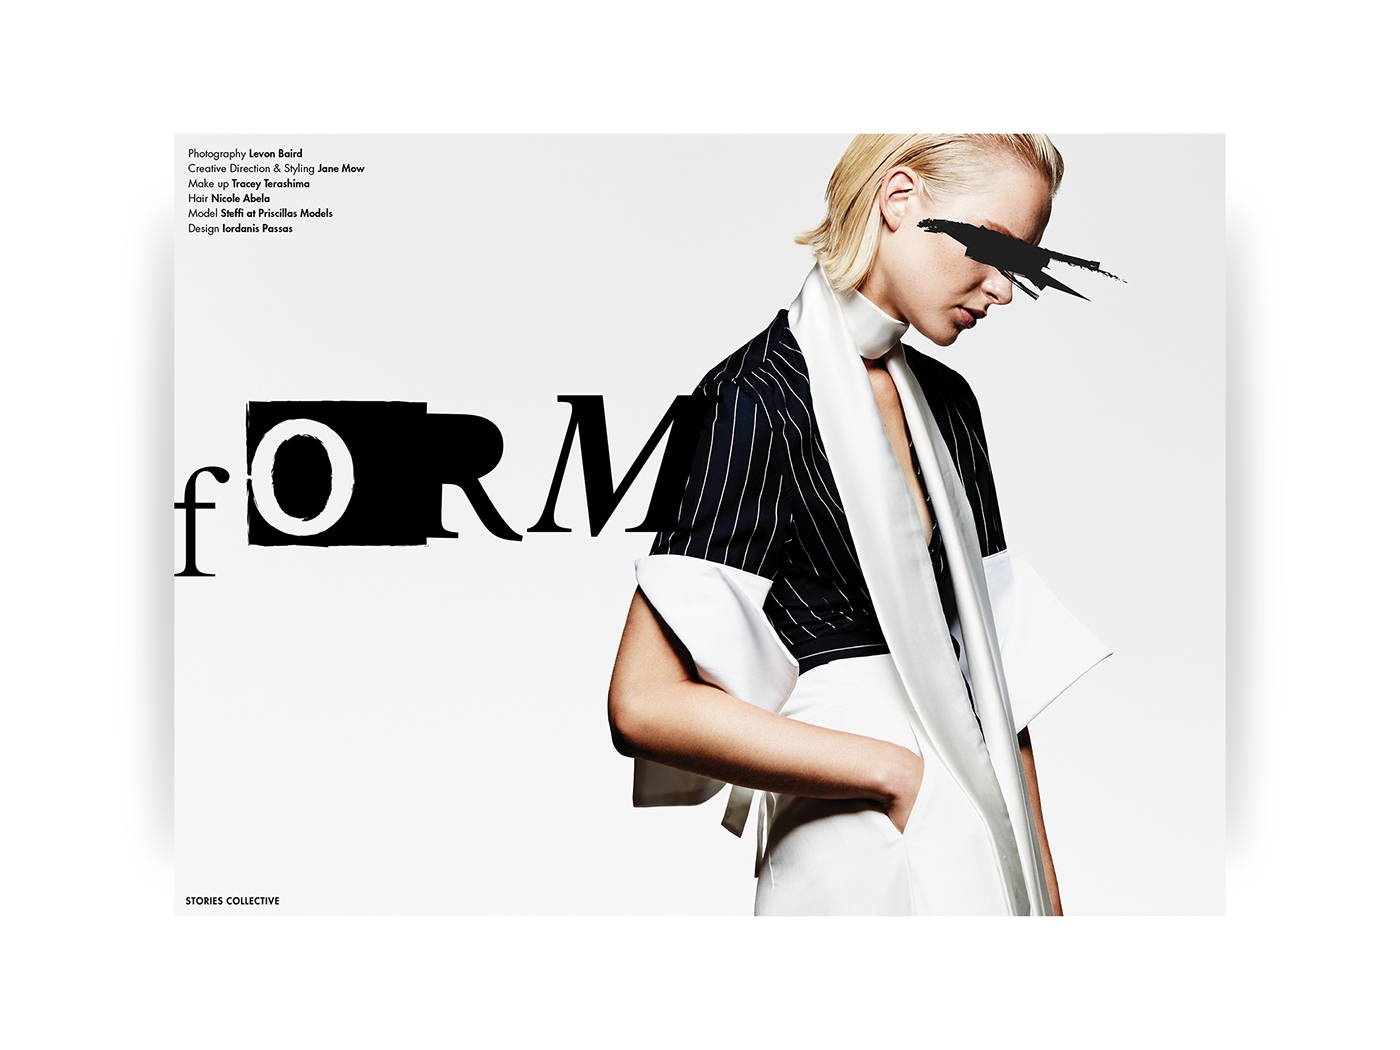 iordanis passas Layout Design stories collective Fashion  Magazine design